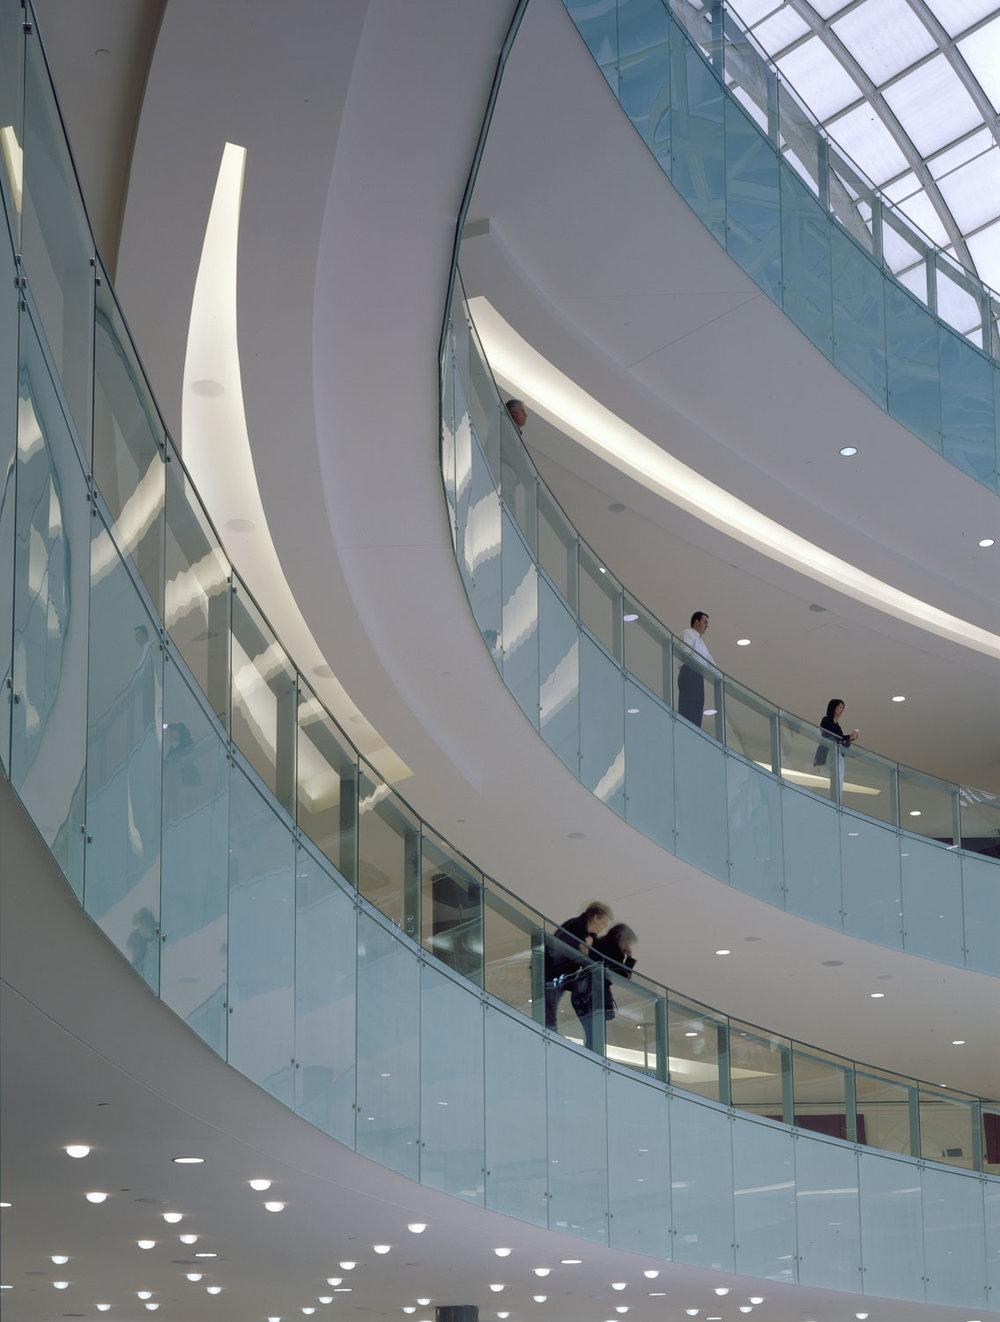 Galleria_web-22.jpg